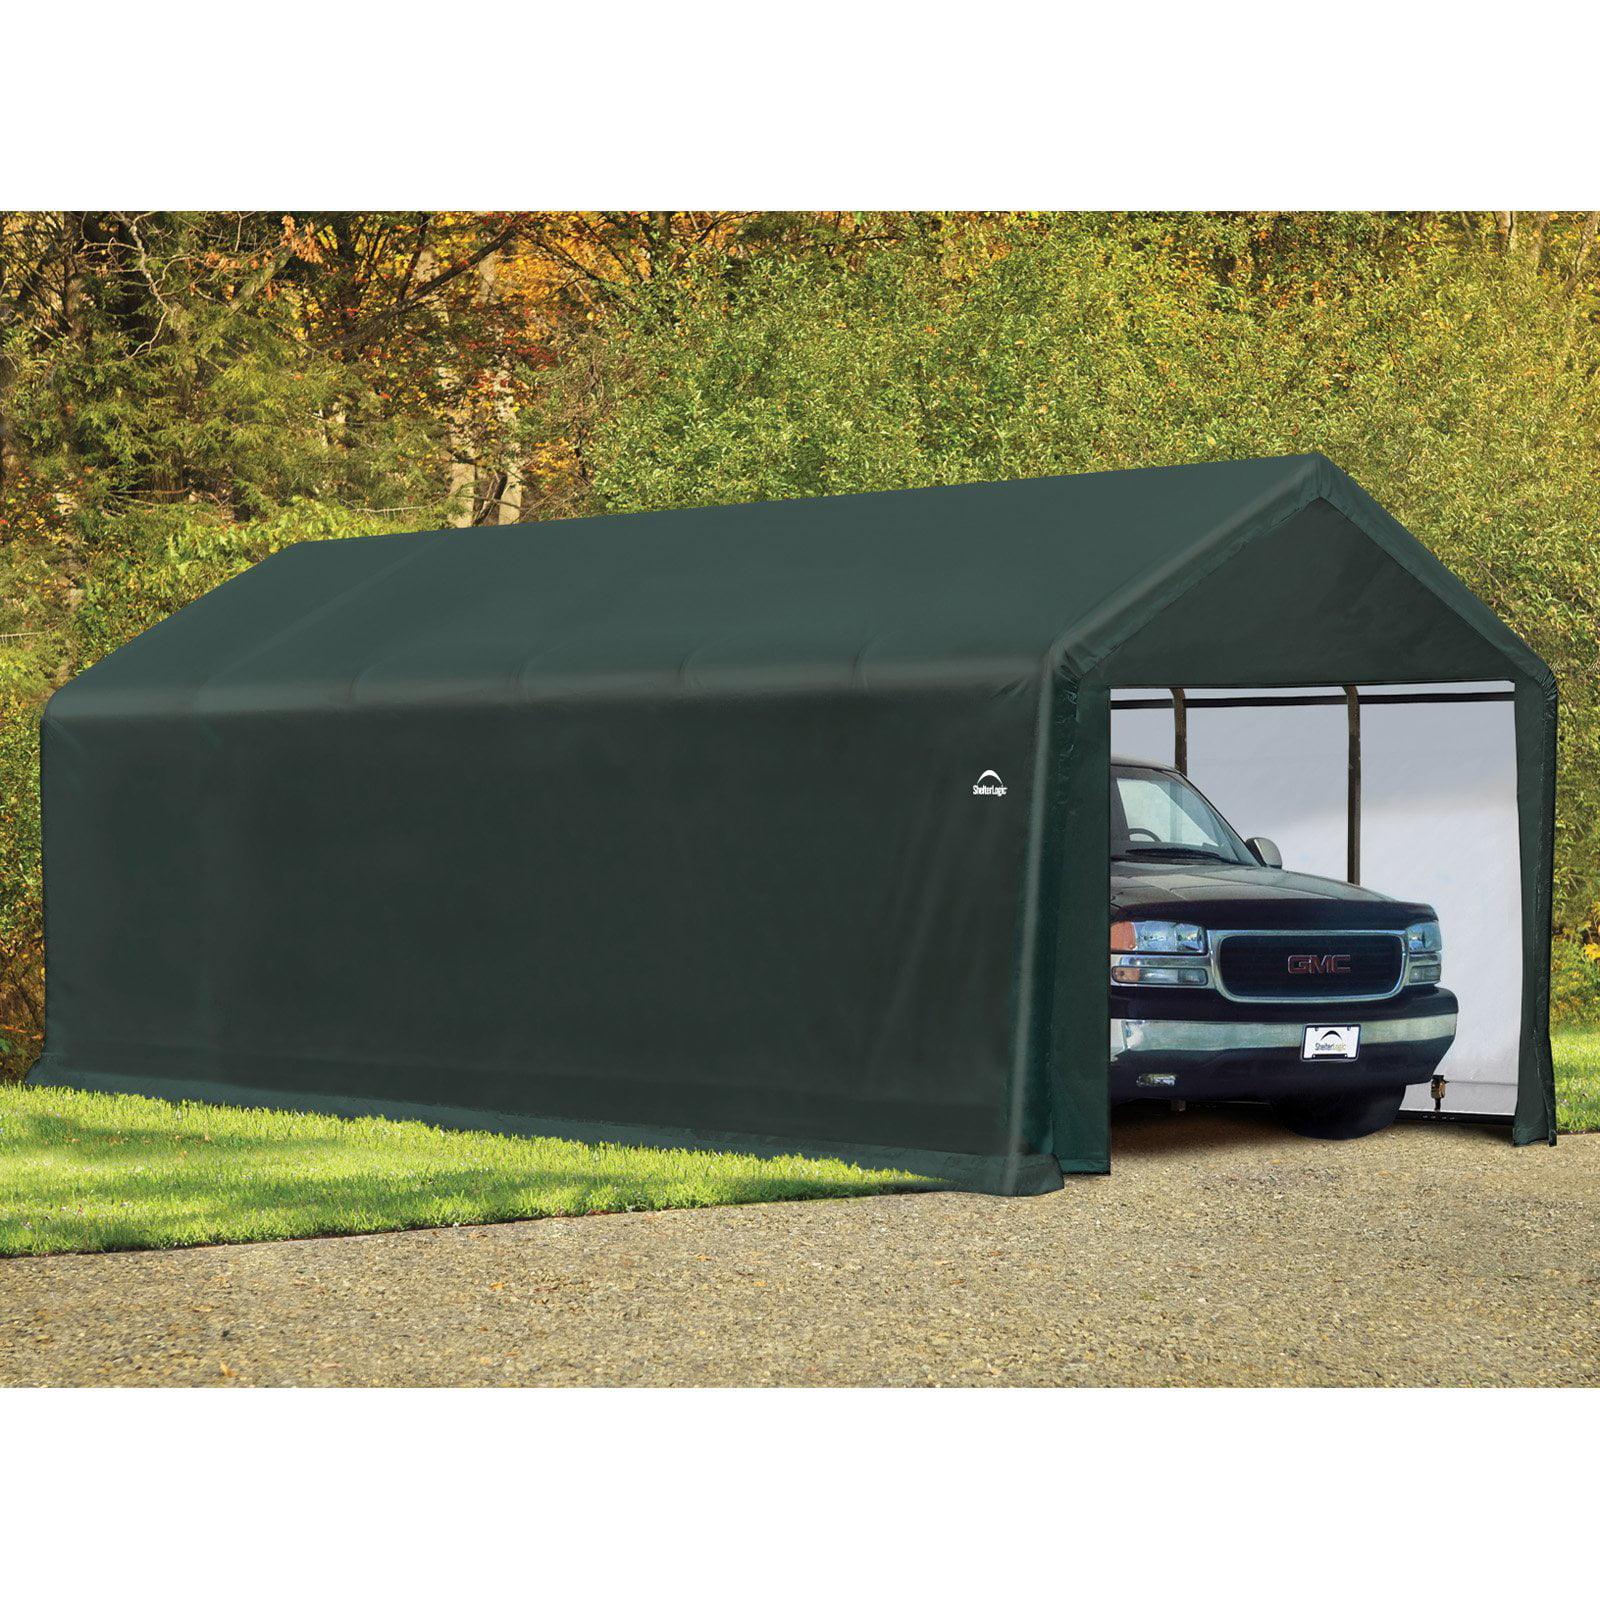 Click here to buy ShelterTube 12' x 30' x 11' Peak Style Garage Shelter, Green by ShelterLogic.